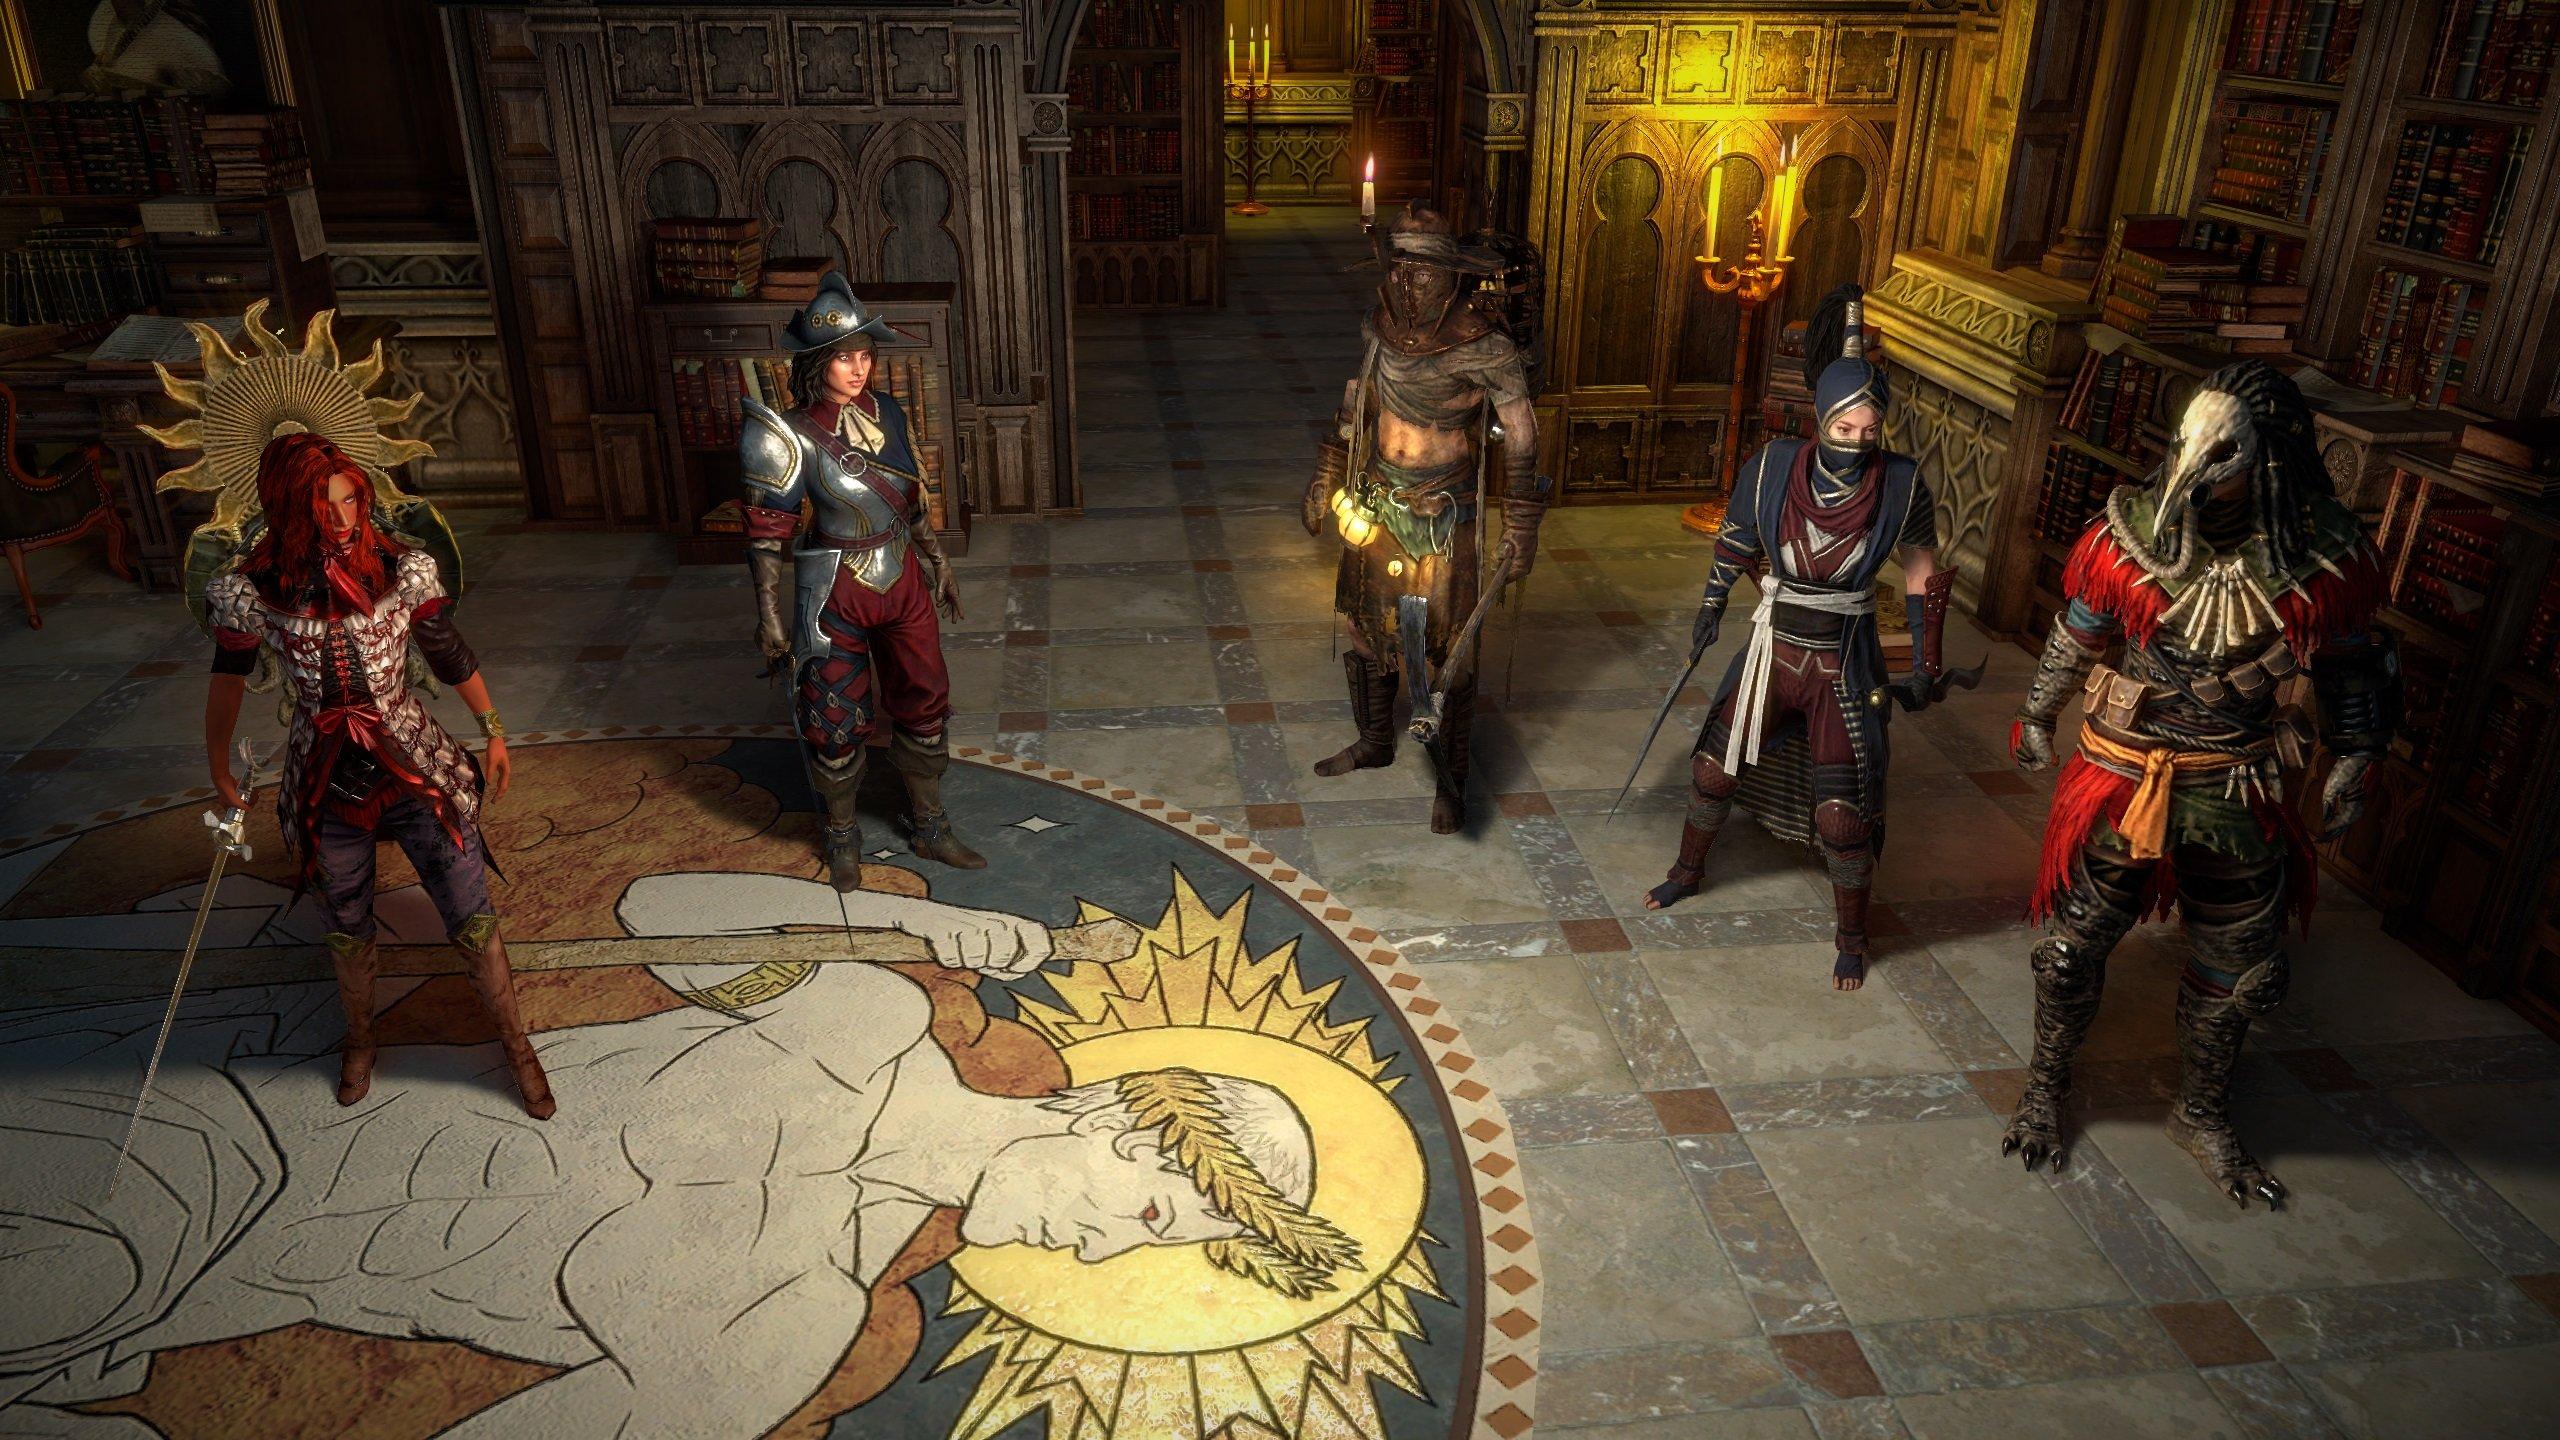 Path Of Exile 350 Prepares For Betrayal And Playstation 4 Shacknews